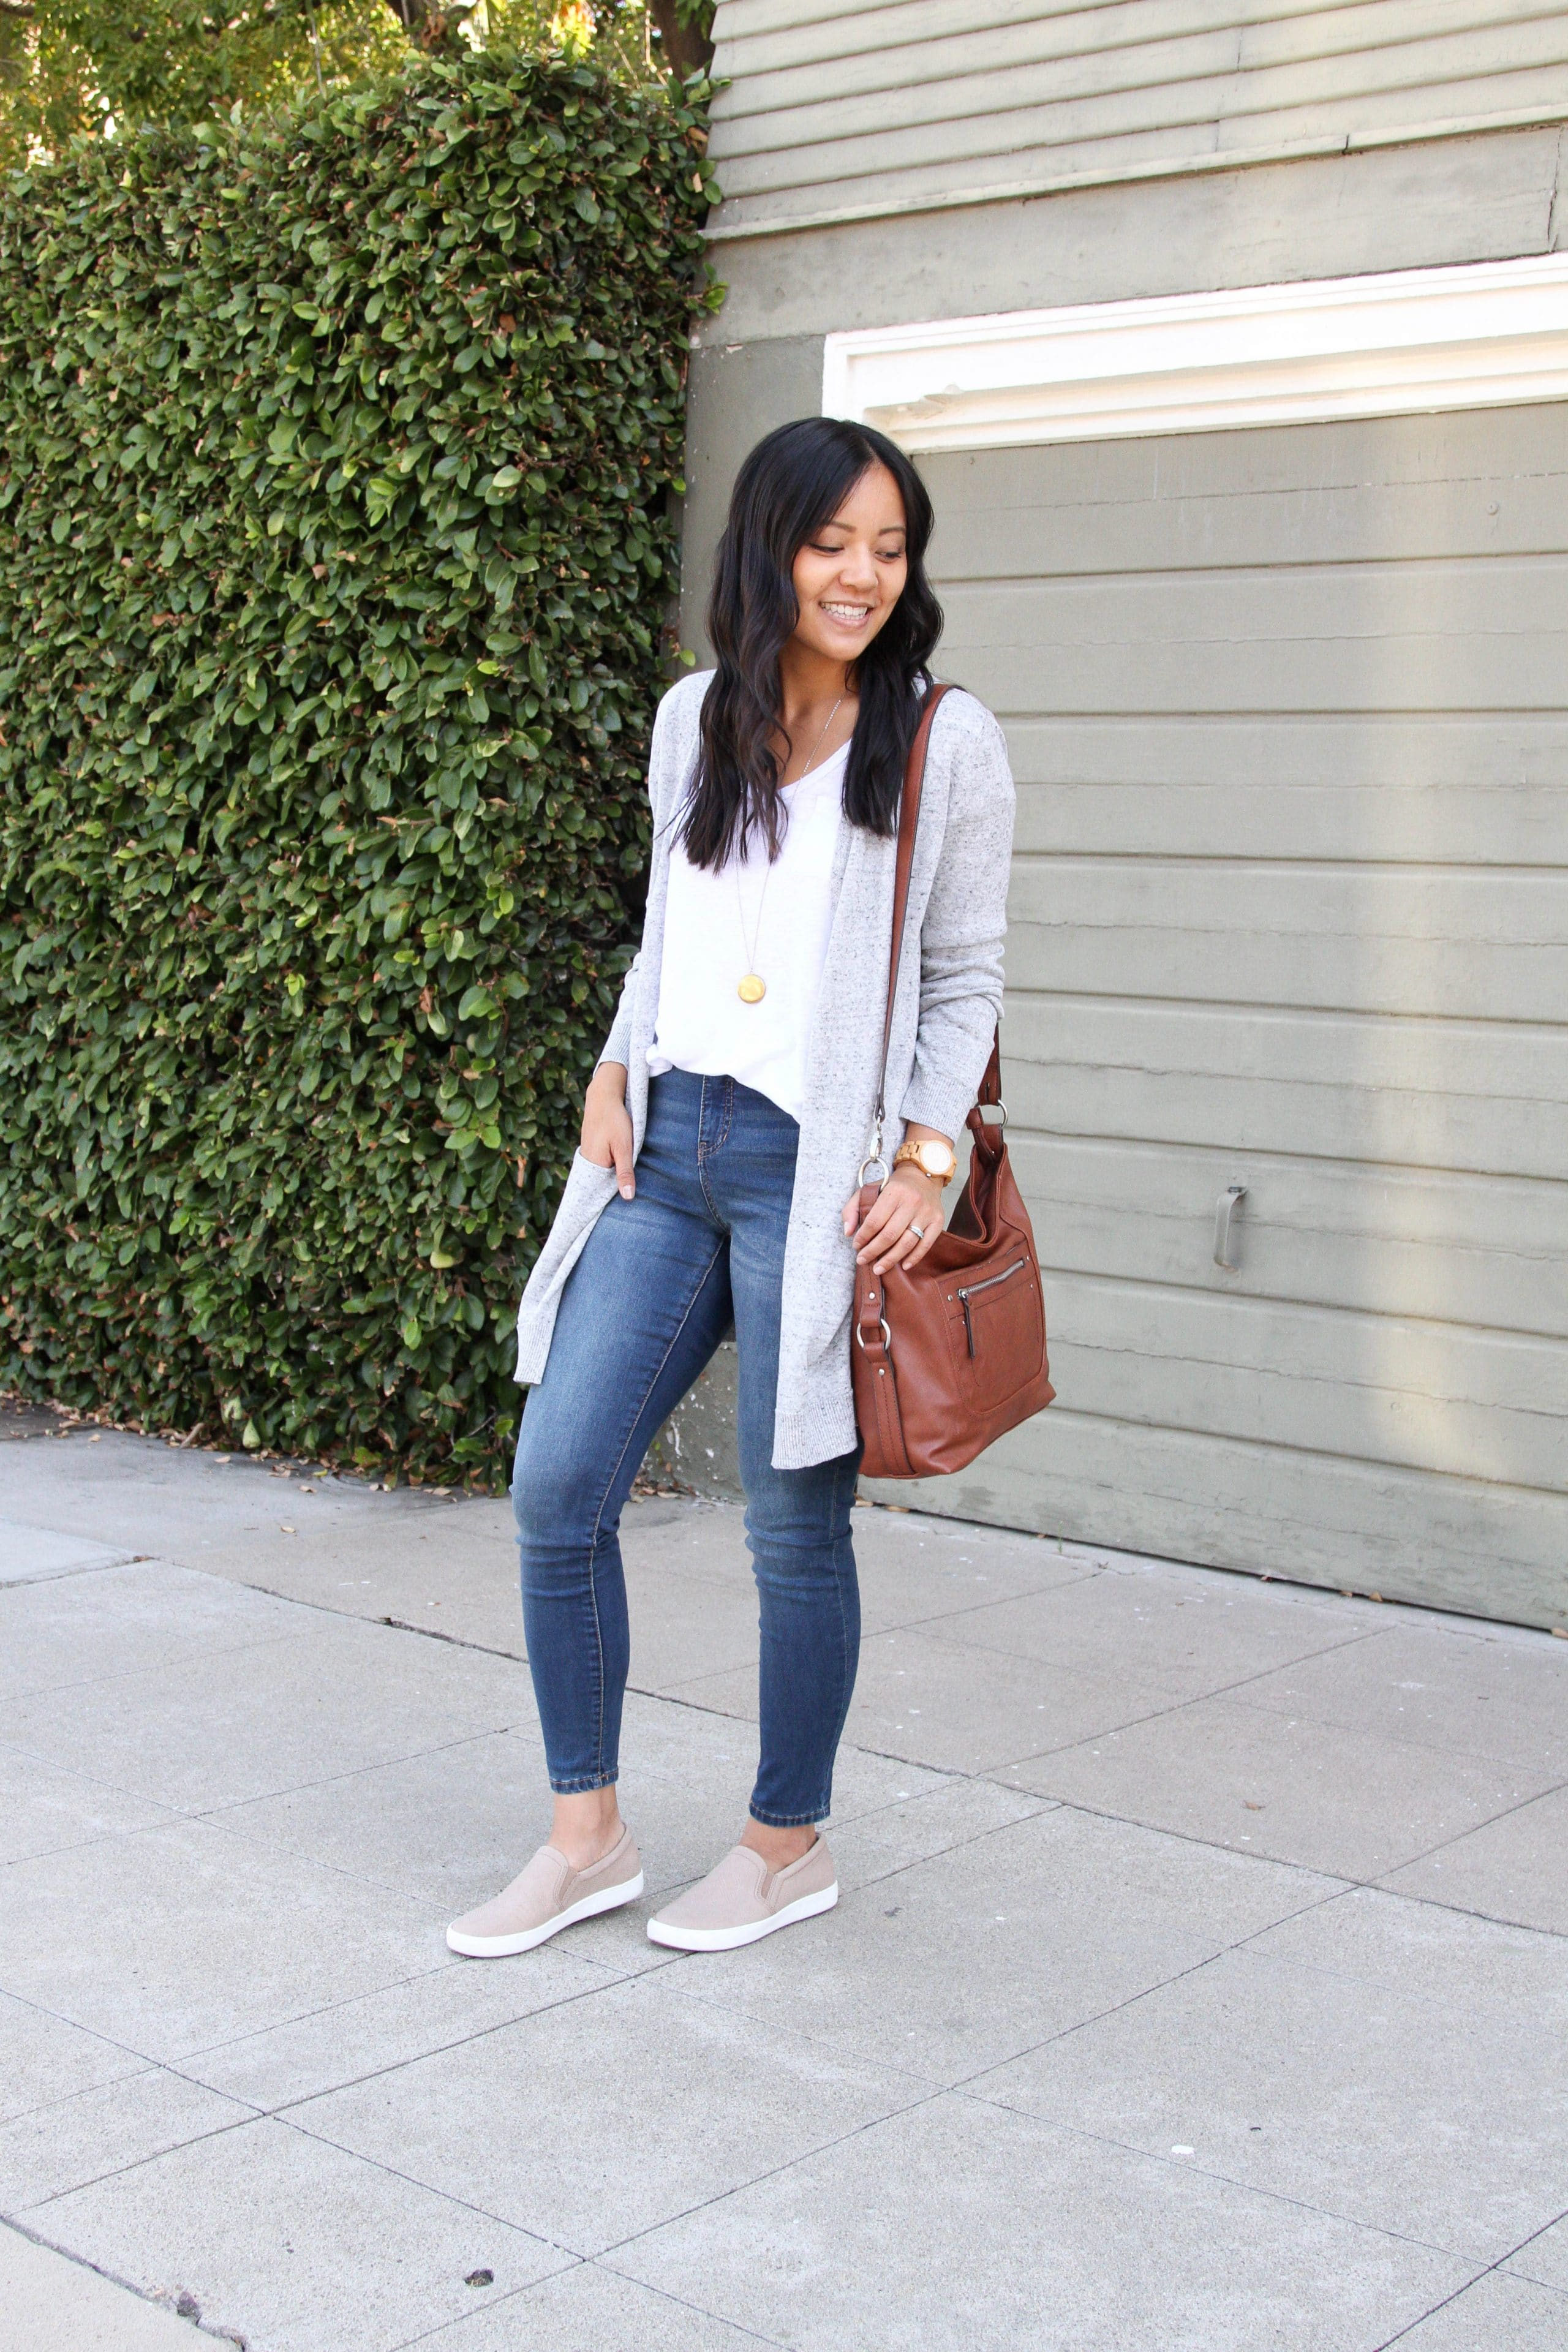 white tee + grey sweater + cognac purse + skinny jeans + tan slip on sneakers